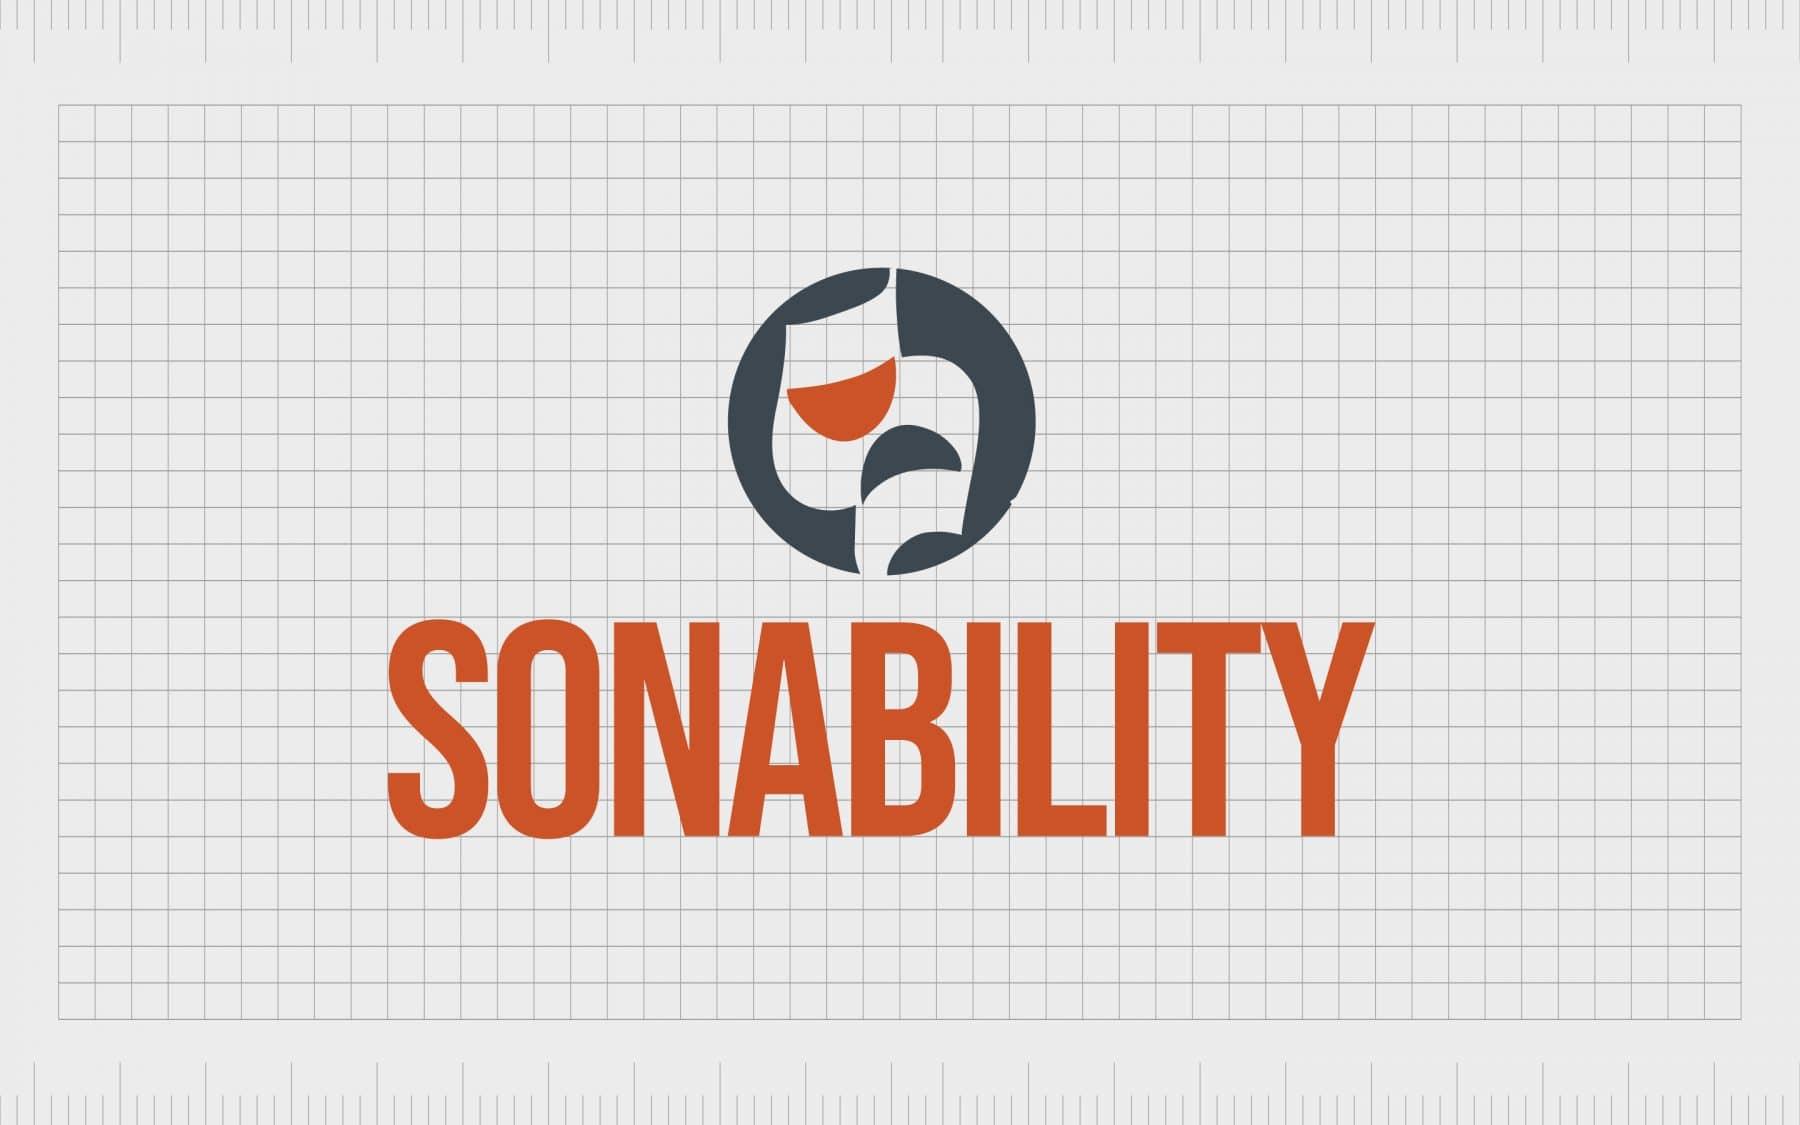 Sonability